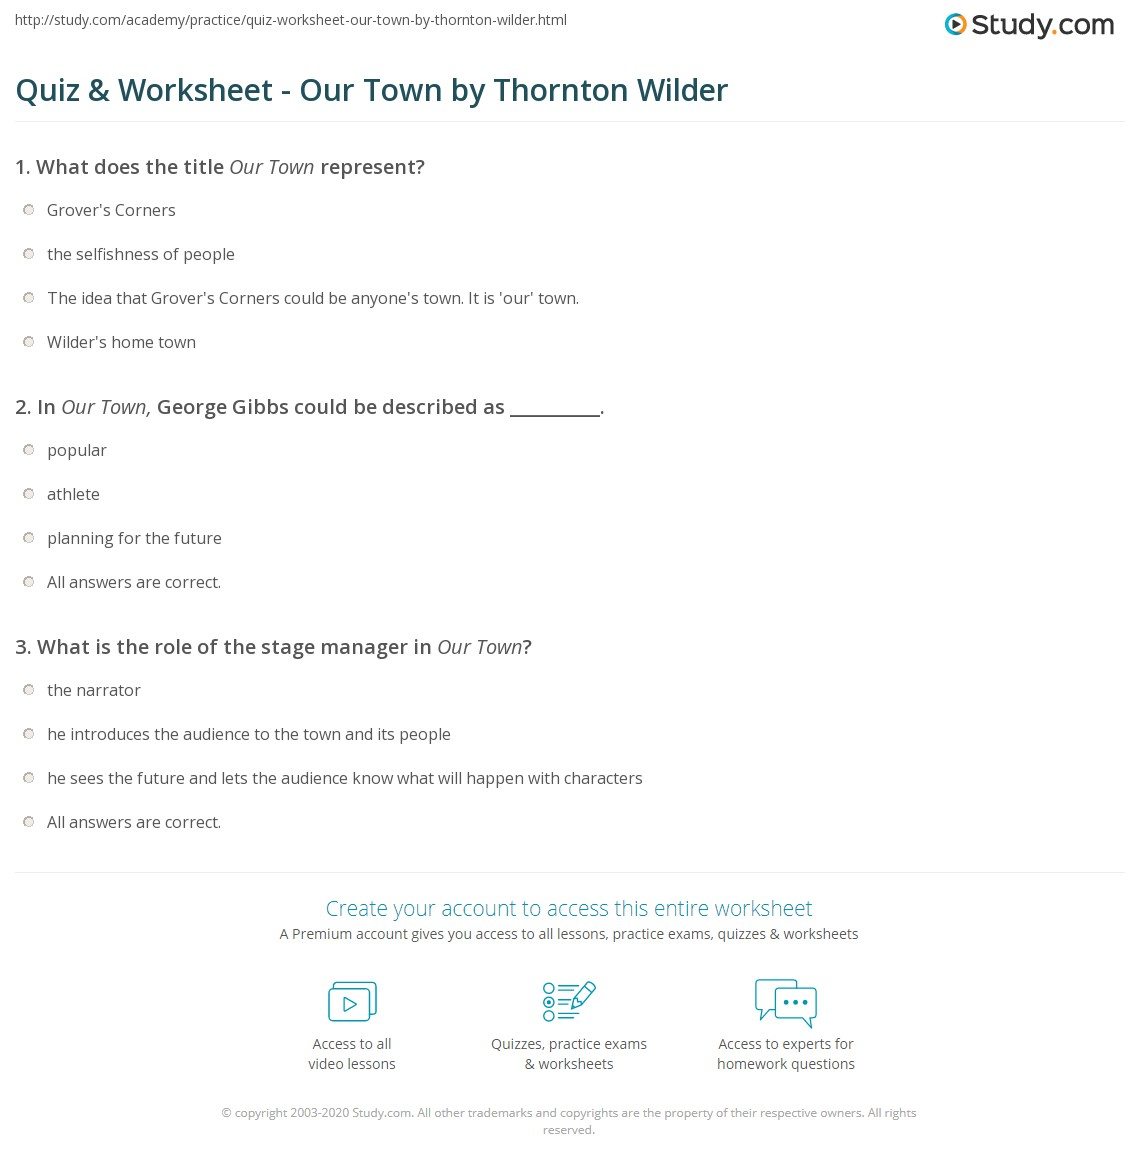 Quiz & Worksheet - Our Town by Thornton Wilder   Study.com